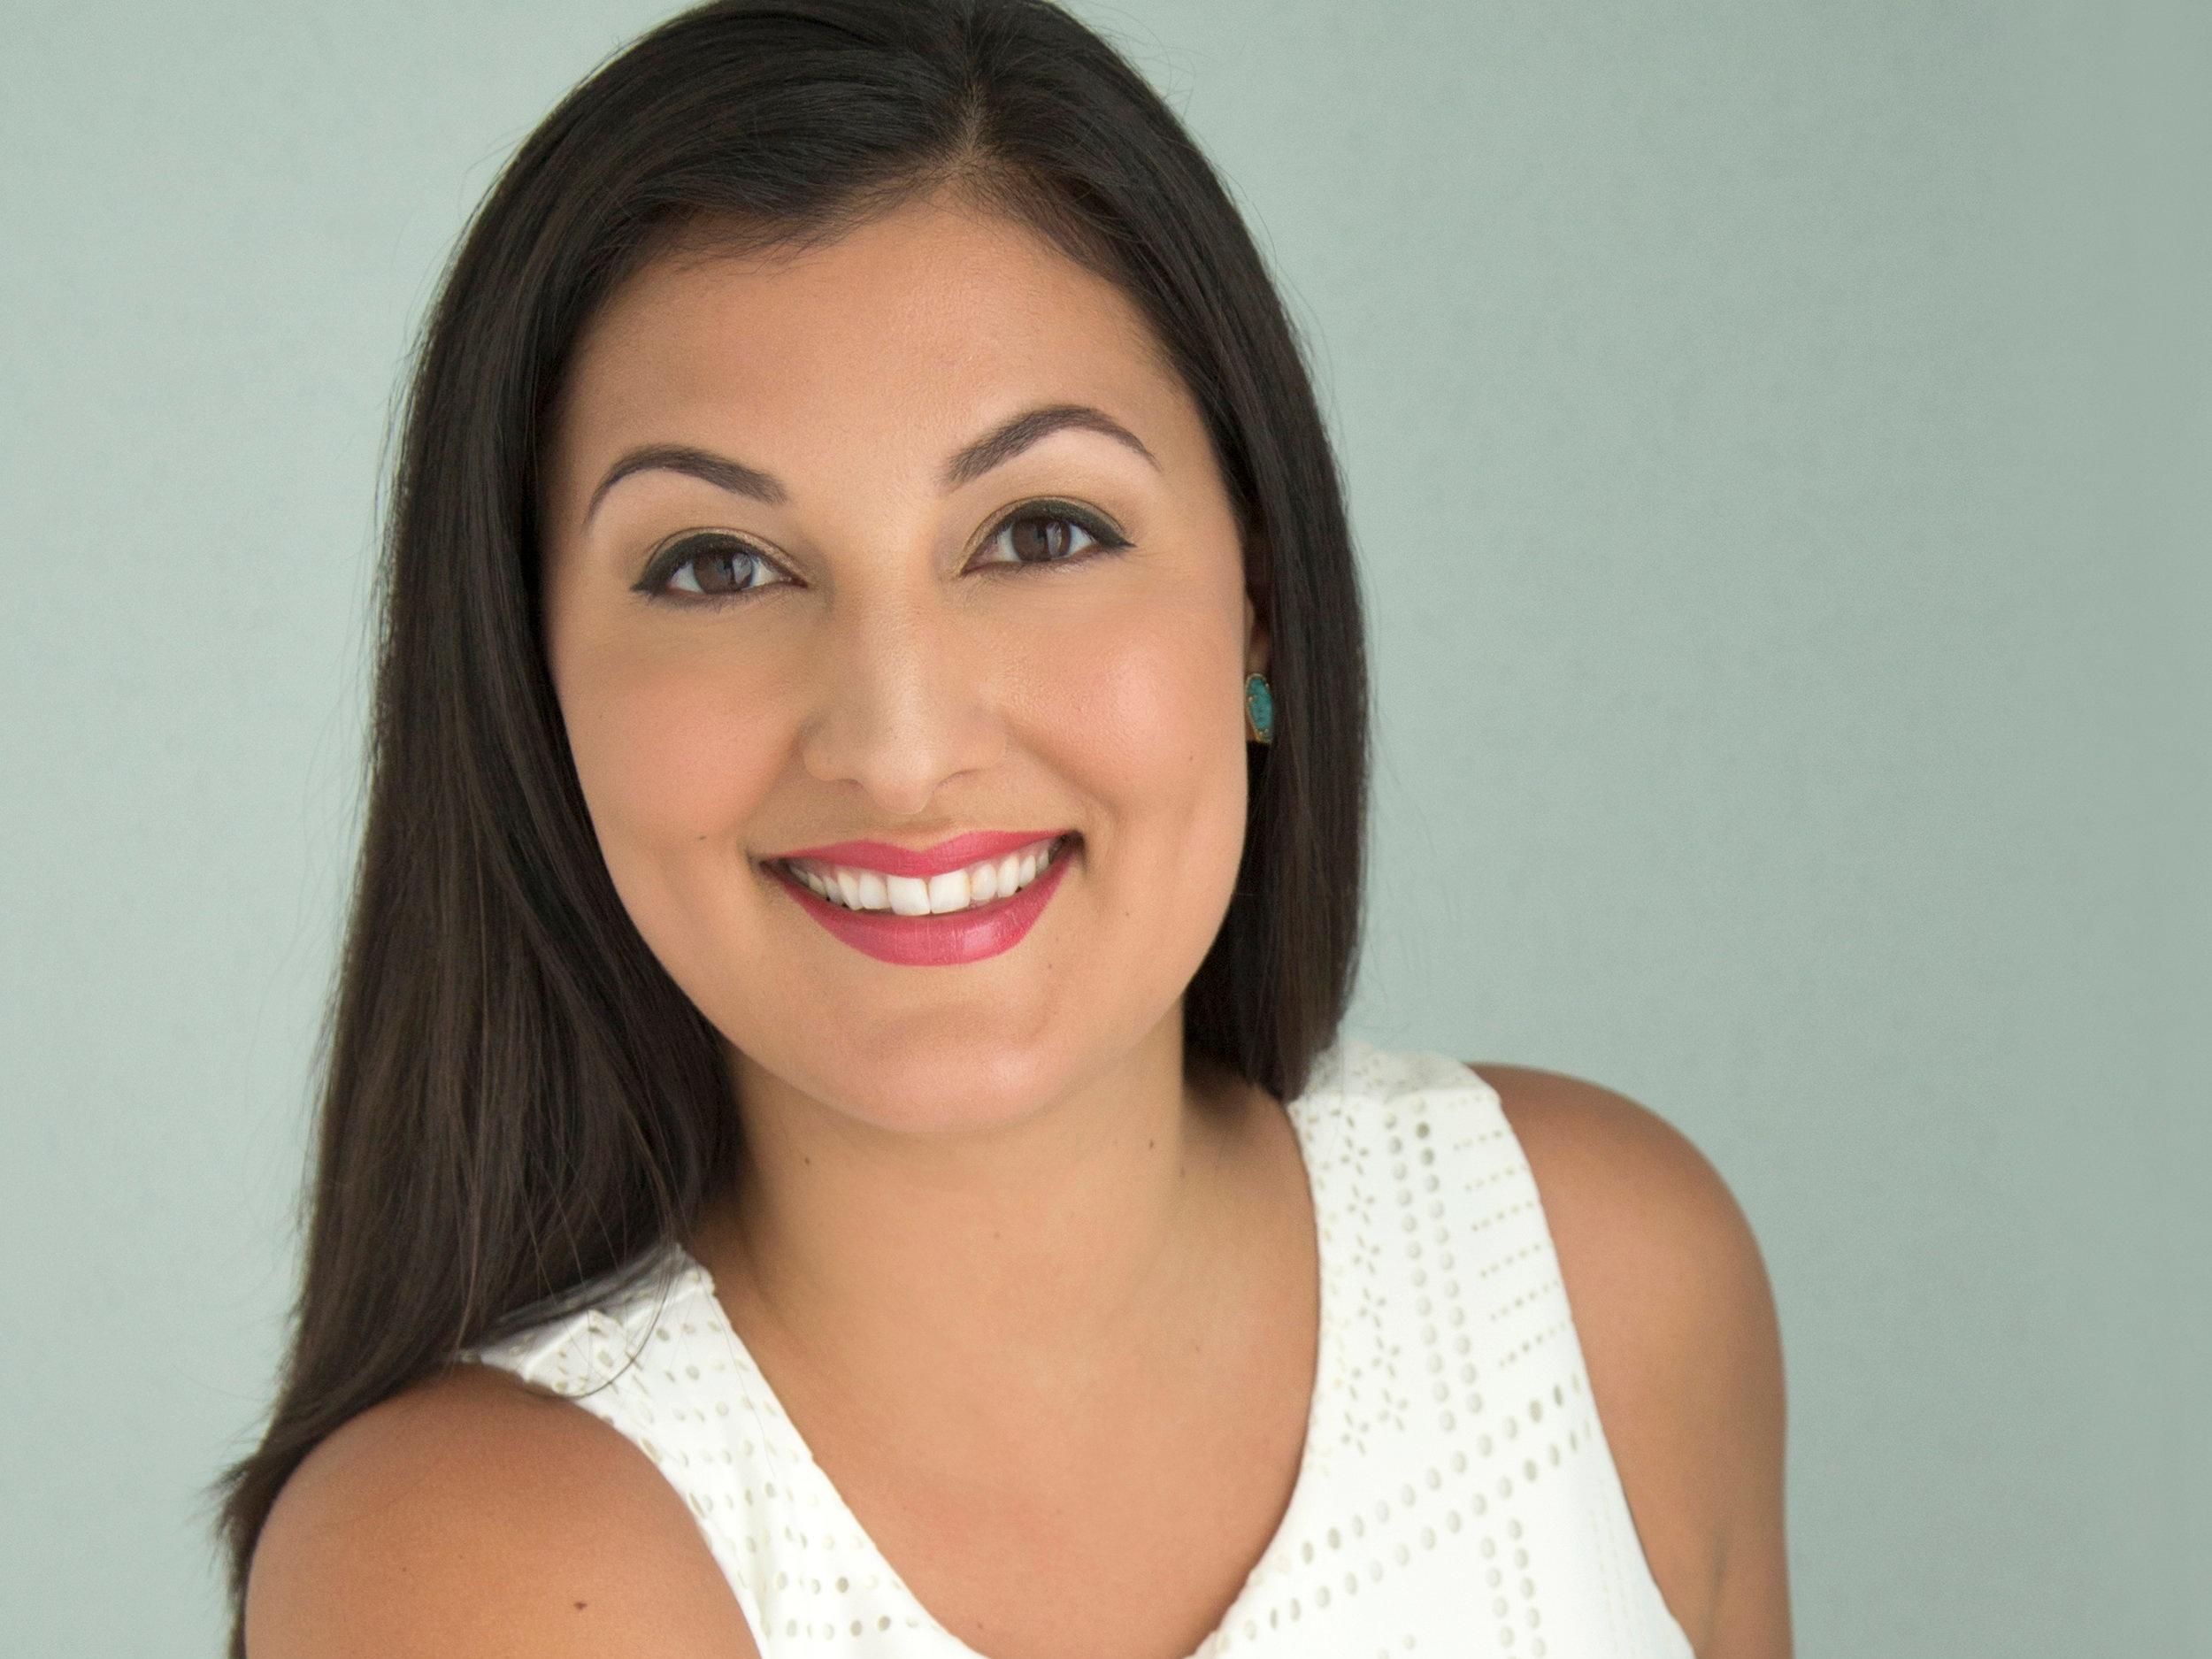 Melinda Grimaldi - real estate attorney, grimaldi law firm